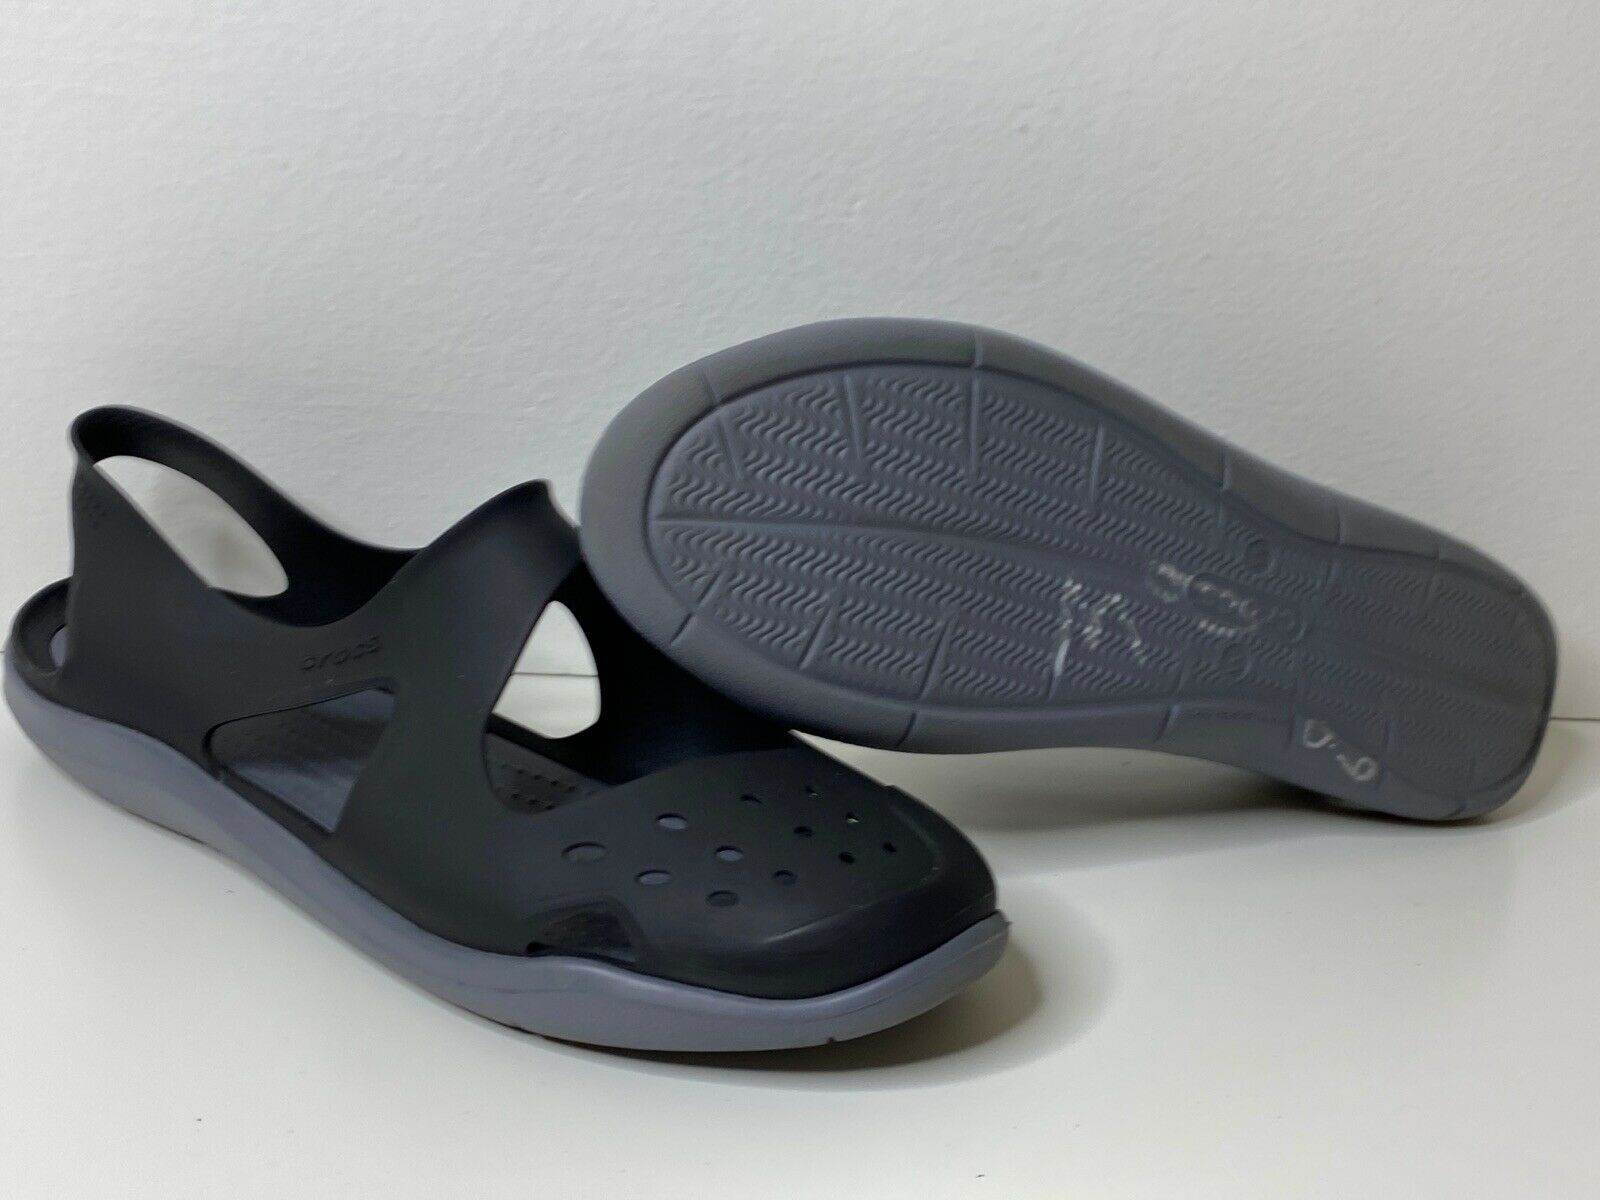 Crocs Swiftwater Wave Womens Water Shoe